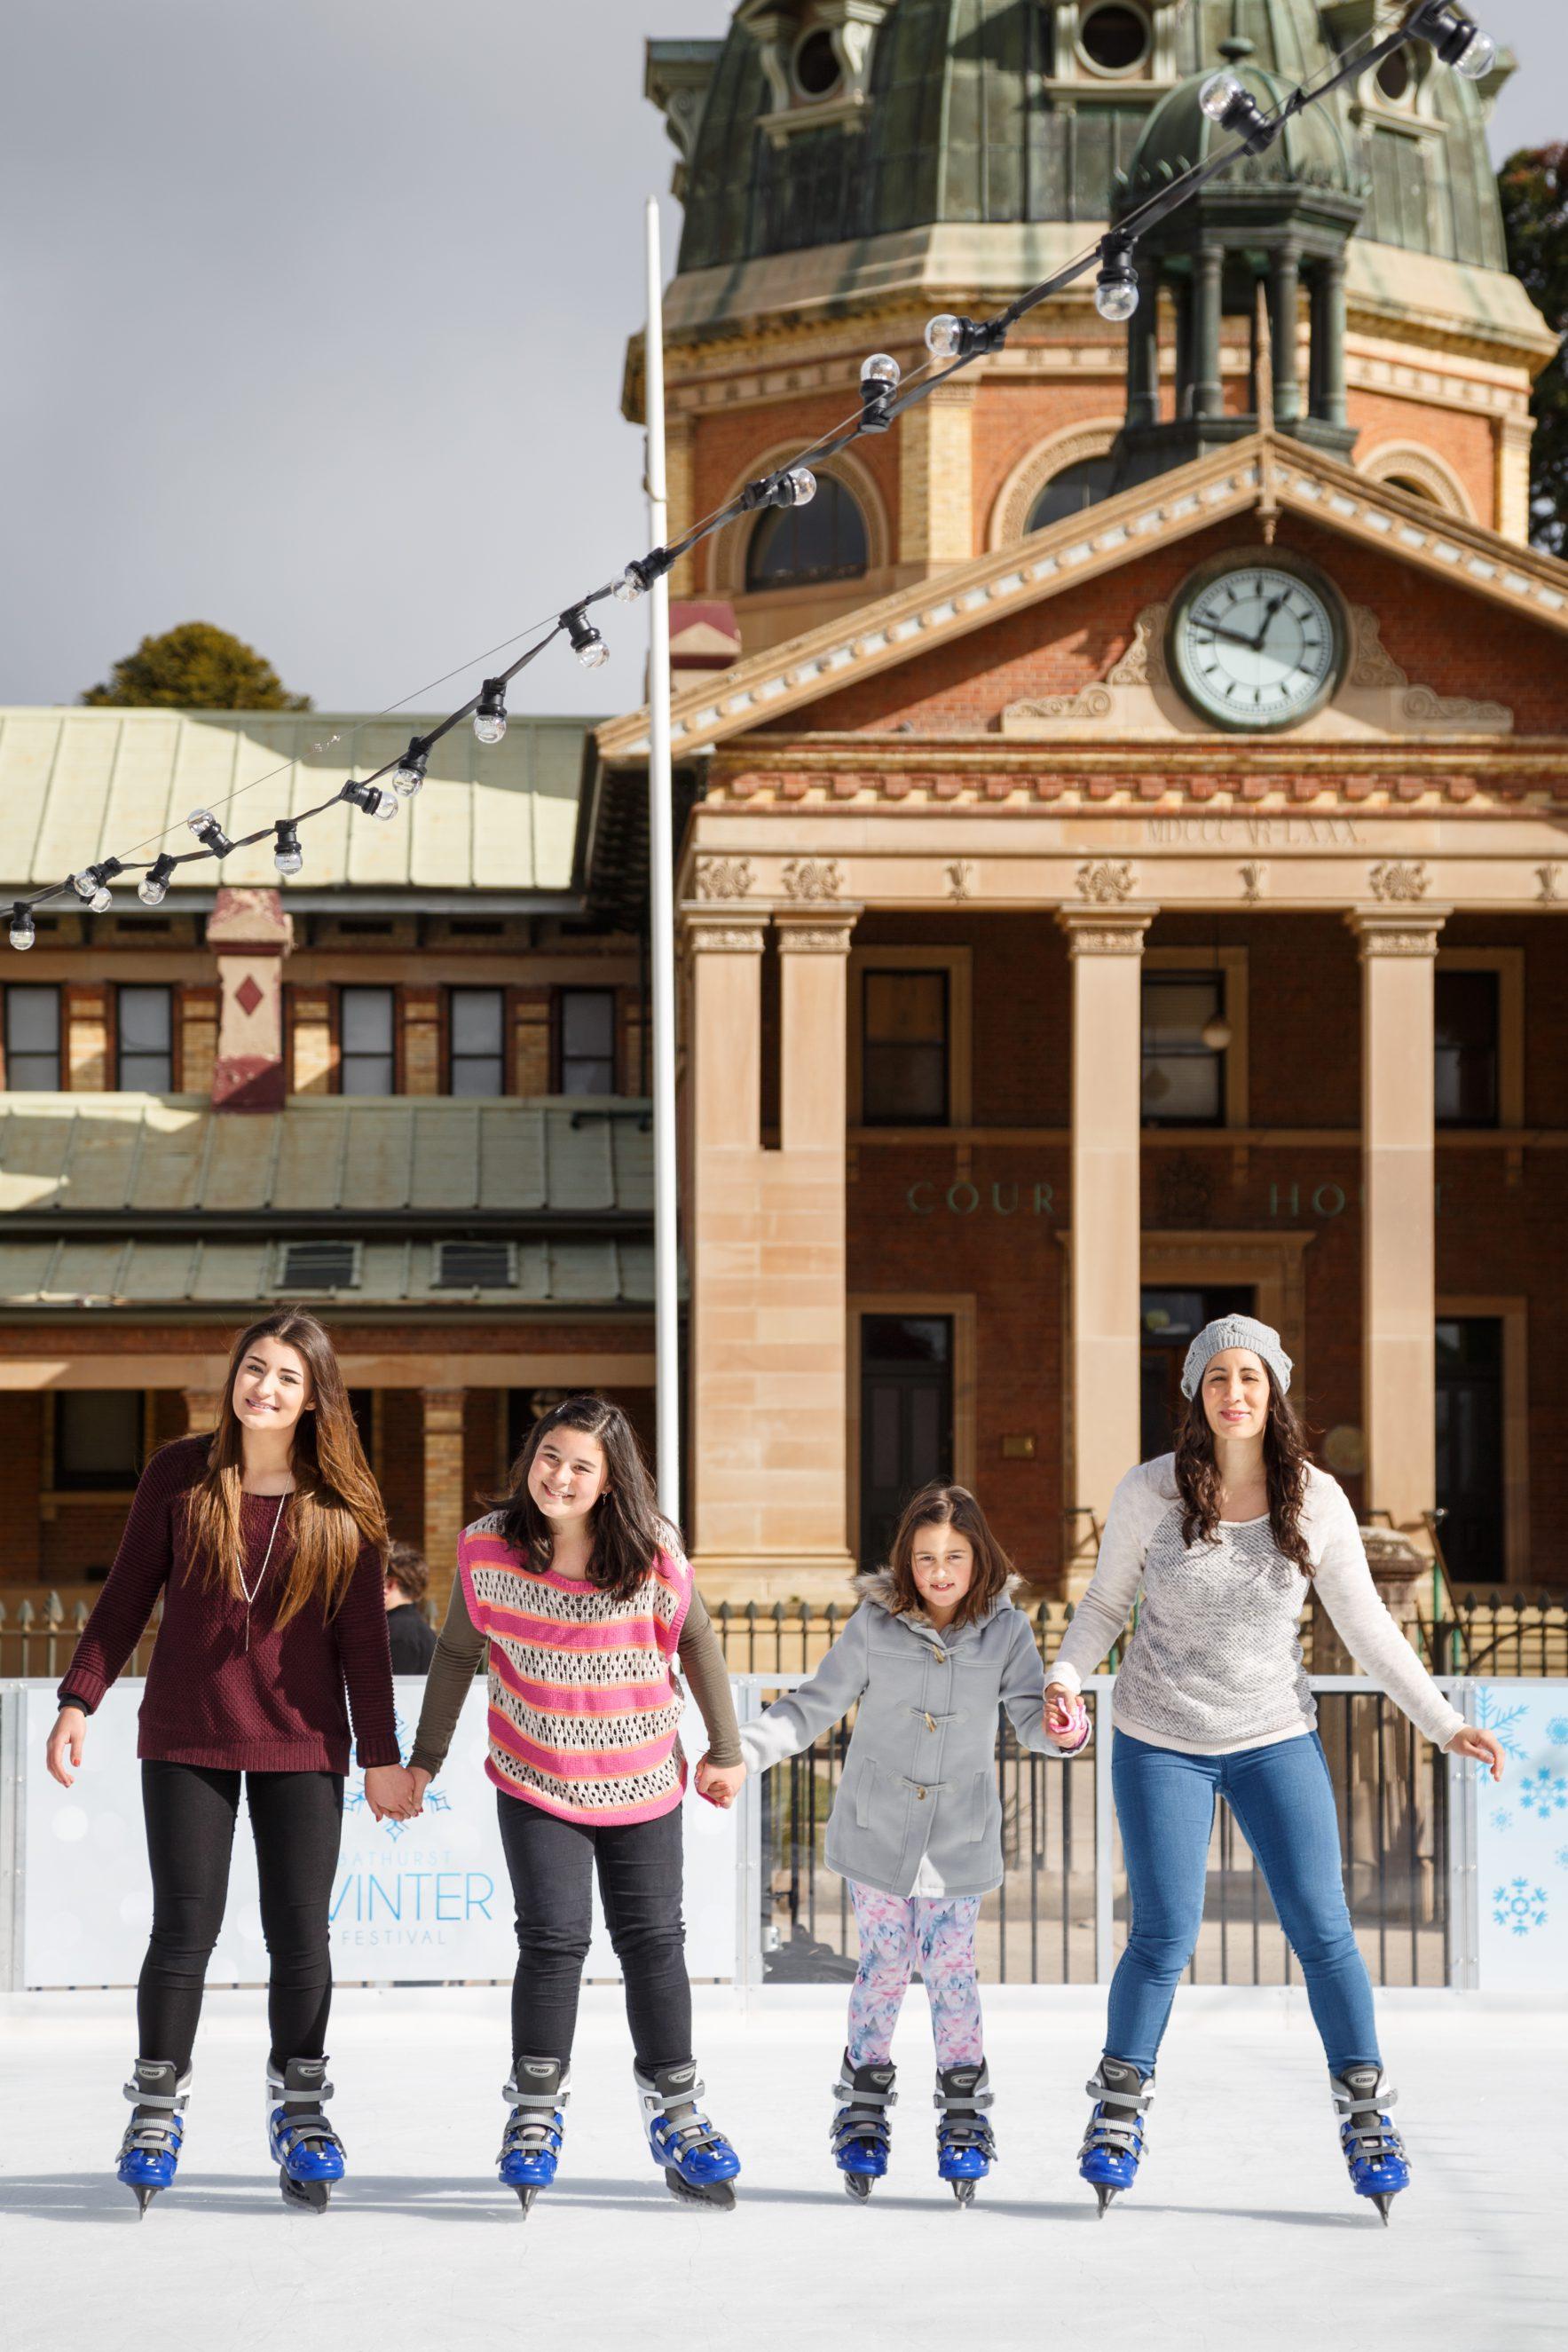 2016 – Daytime Ice Skating Promo